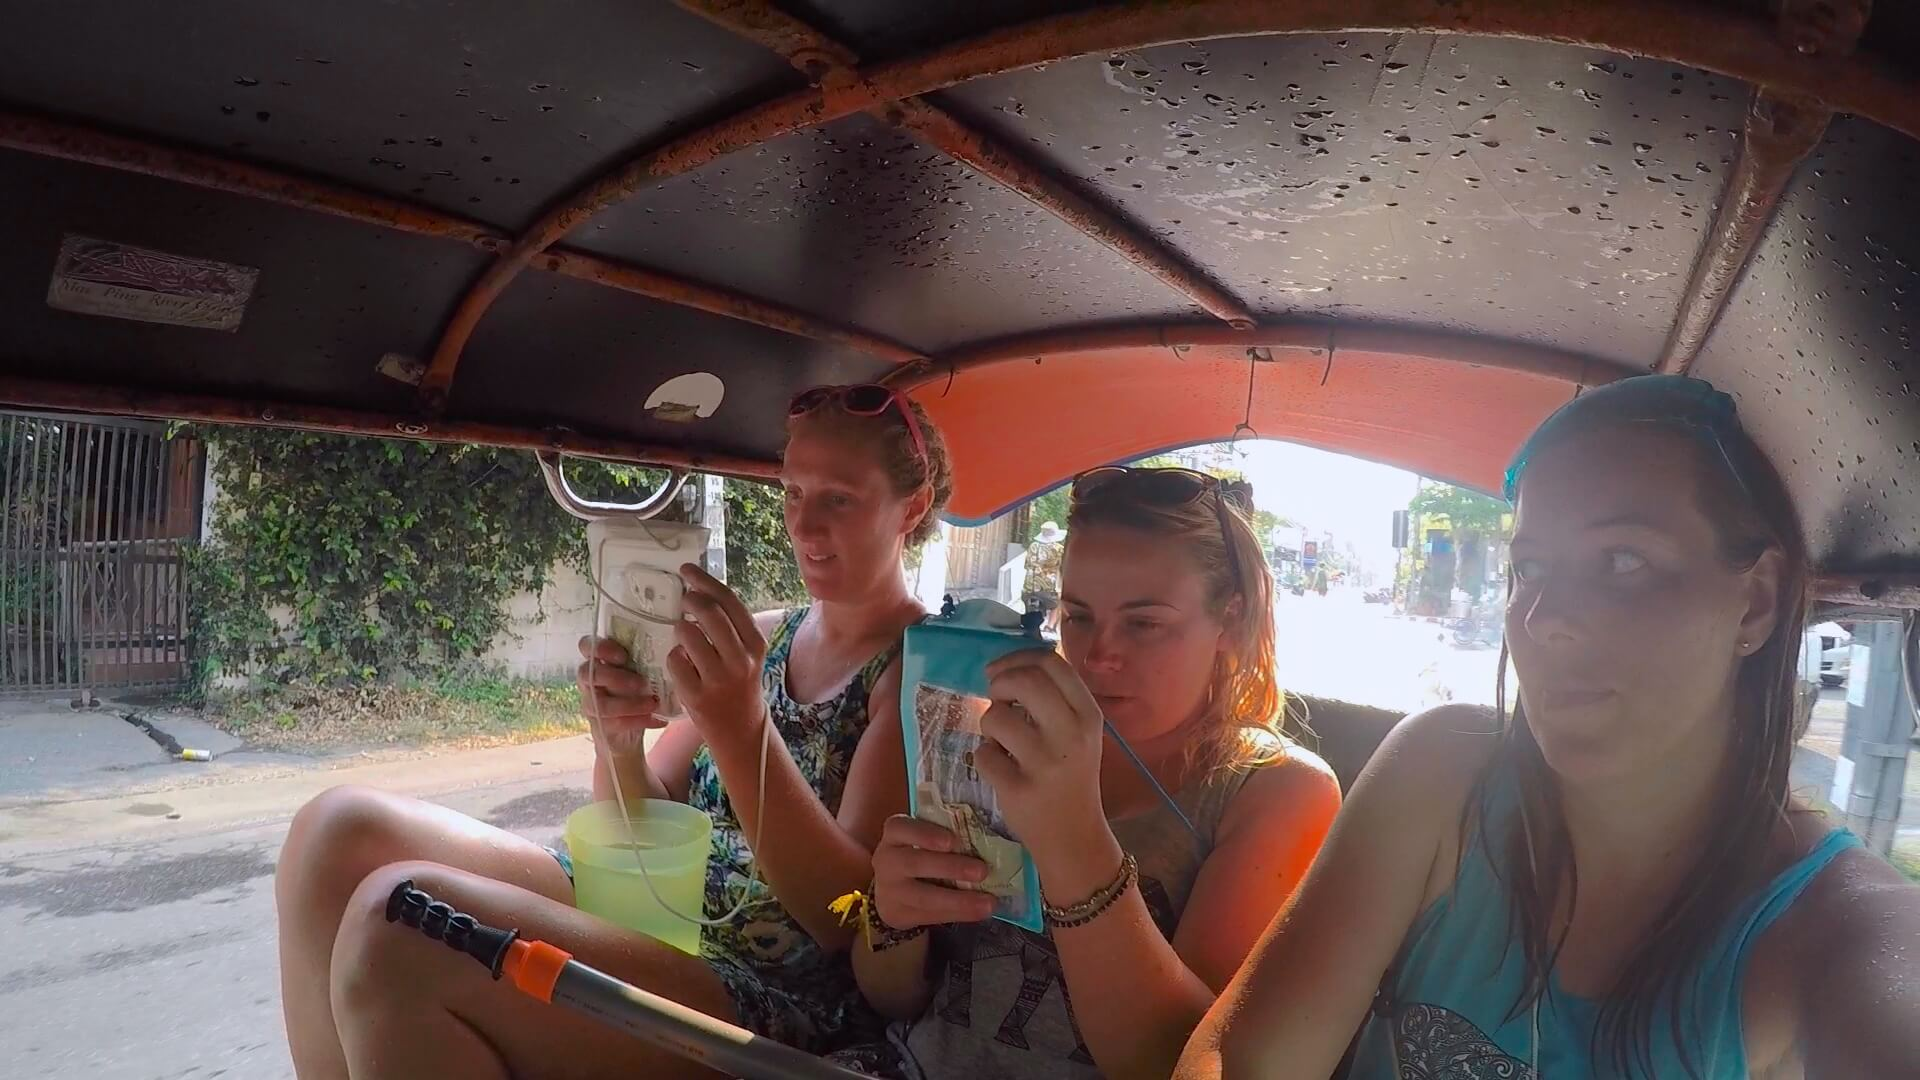 Enjoying riding around in a tuk tuk during Songkran Festival in Chiang Mai